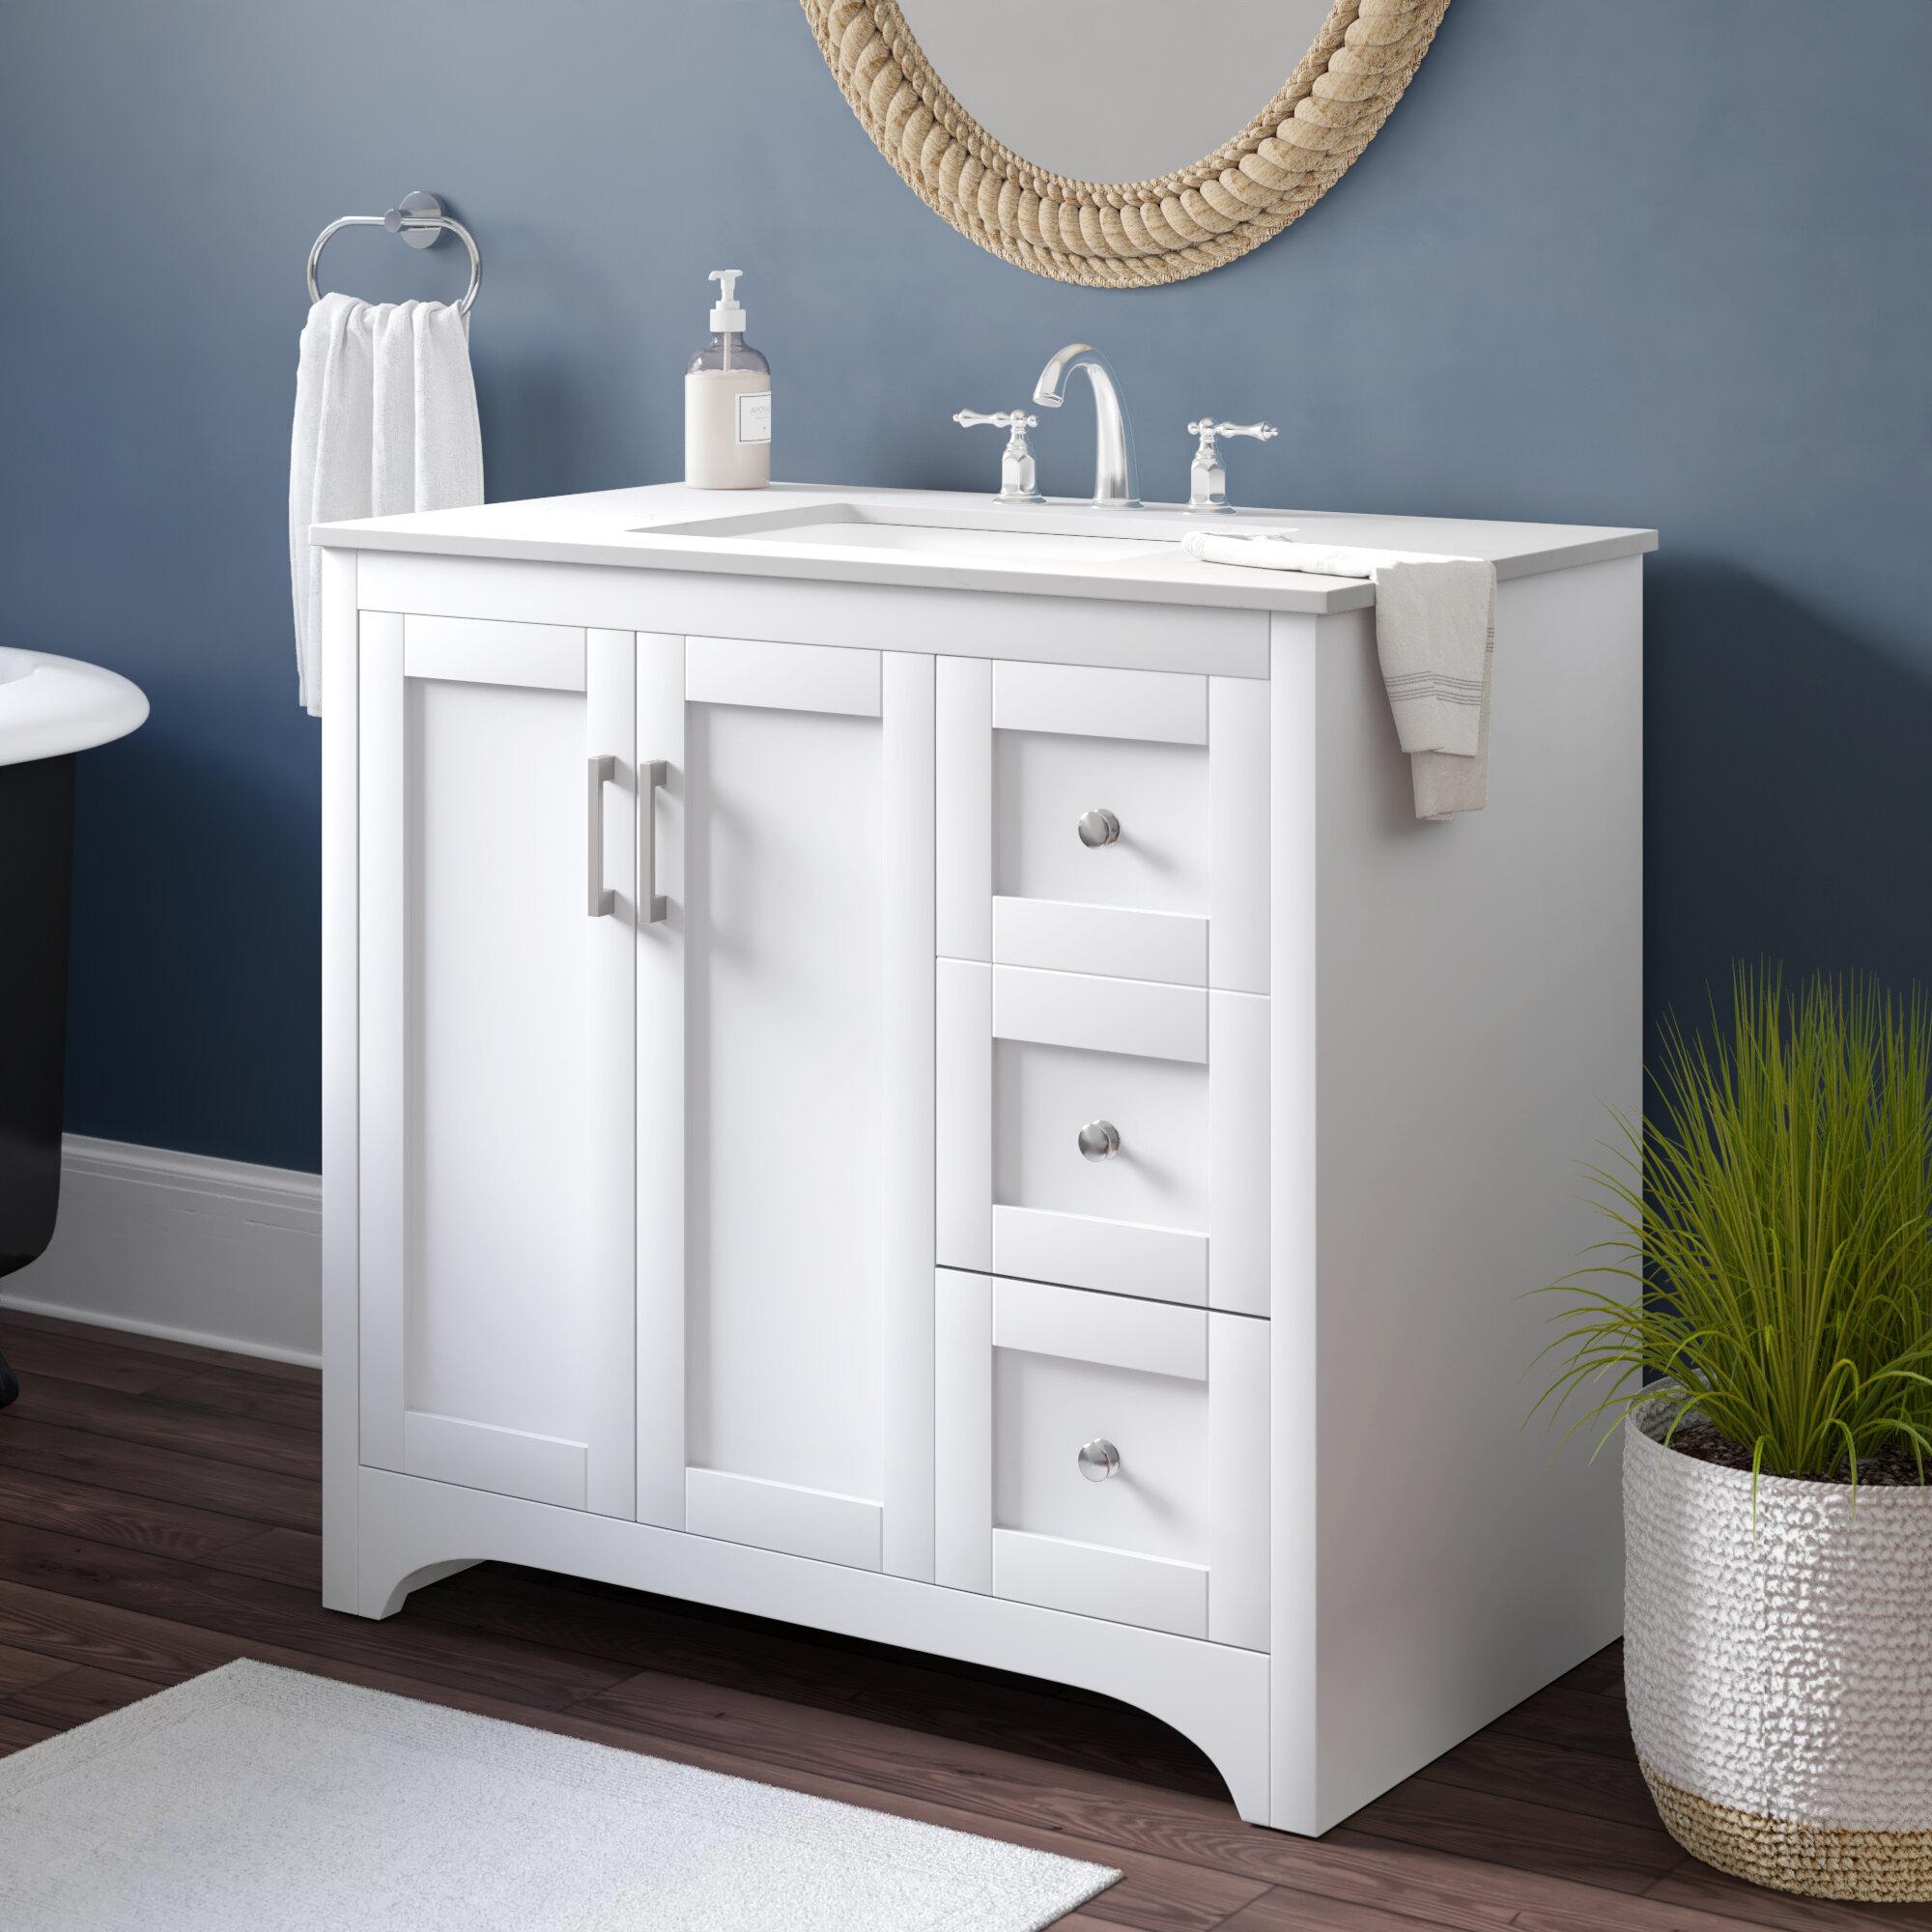 Beachcrest Home Hiroko 36 Single Bathroom Vanity Set Reviews Wayfair